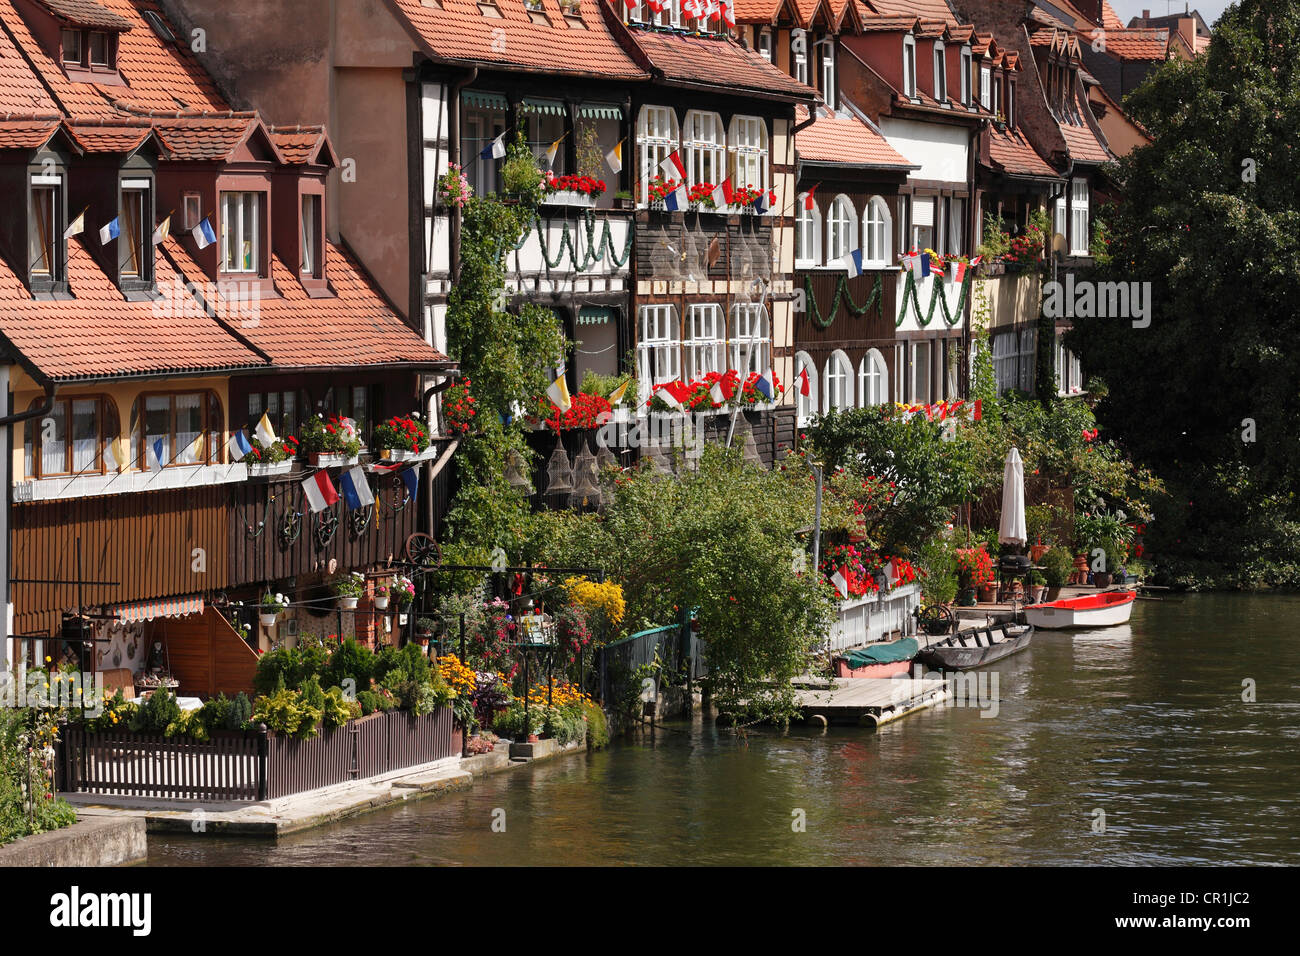 Klein-Venedig, little Venice, and Regnitz river, Bamberg, Upper Franconia, Franconia, Bavaria, Germany, Europe, - Stock Image